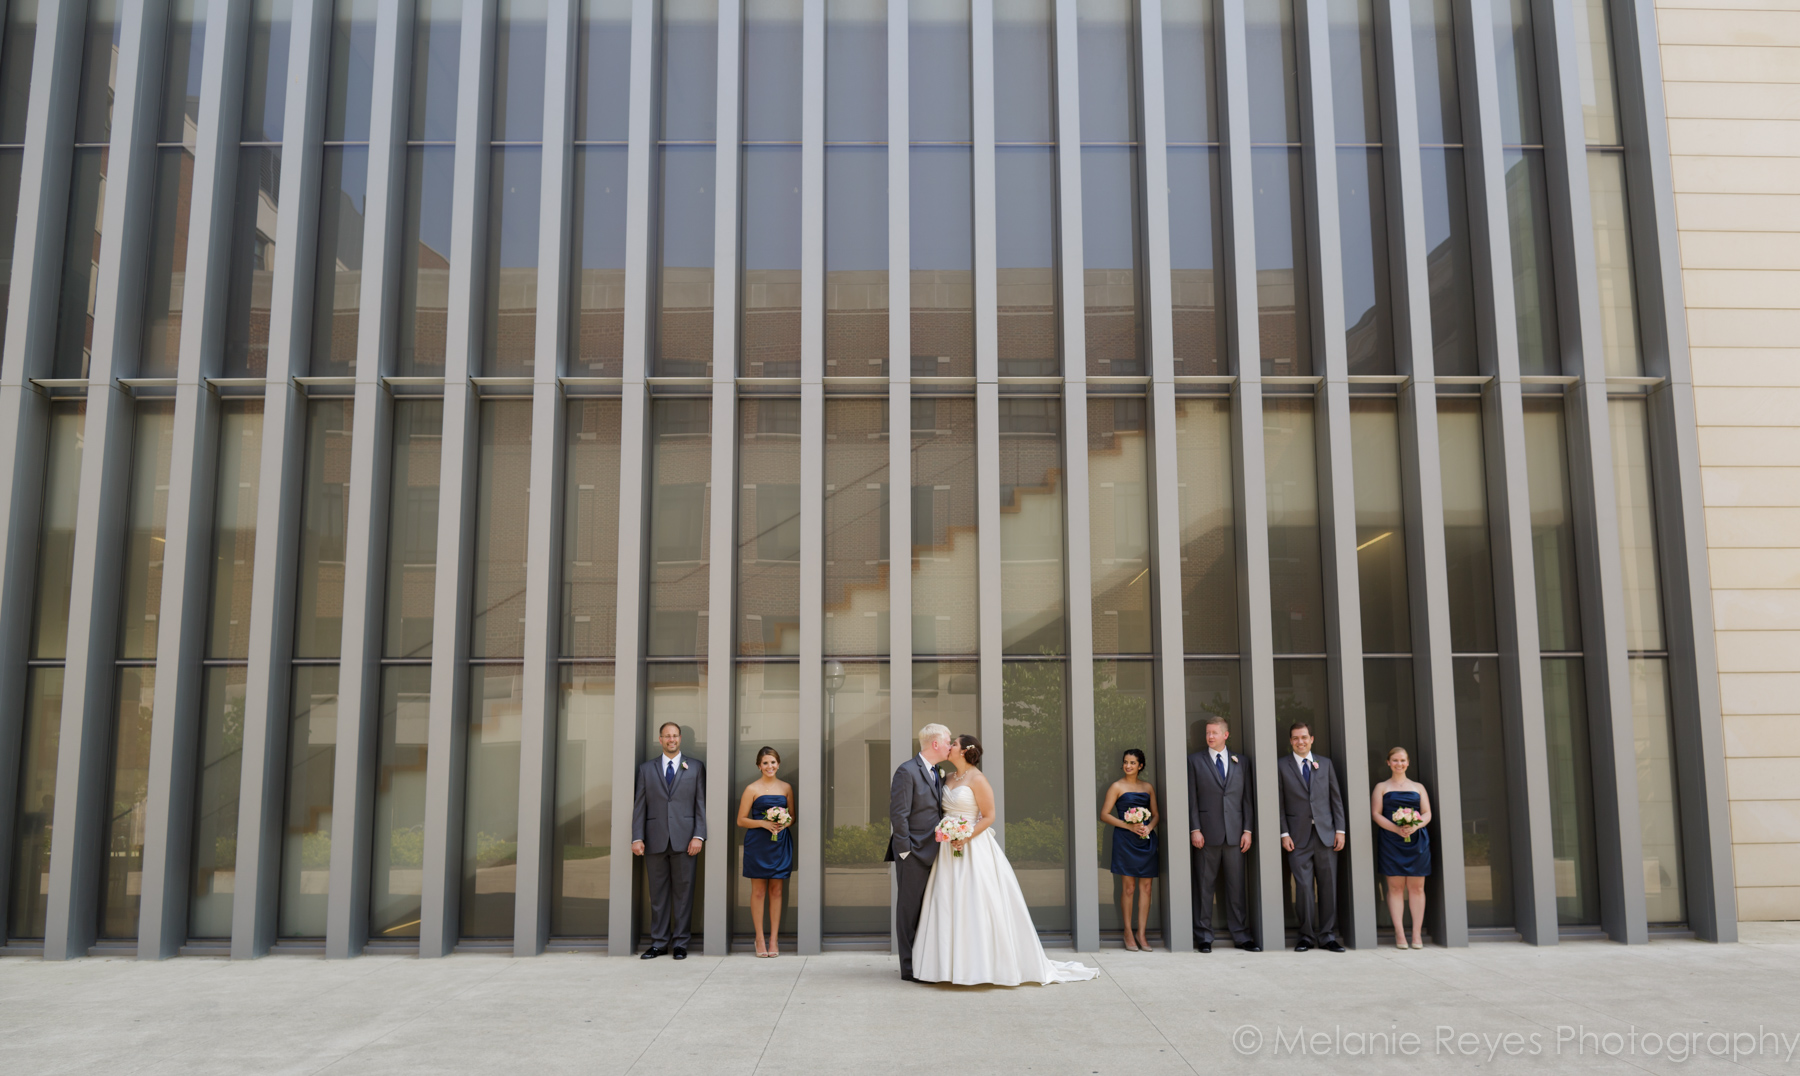 MC_annarbor_uofm_wedding_029